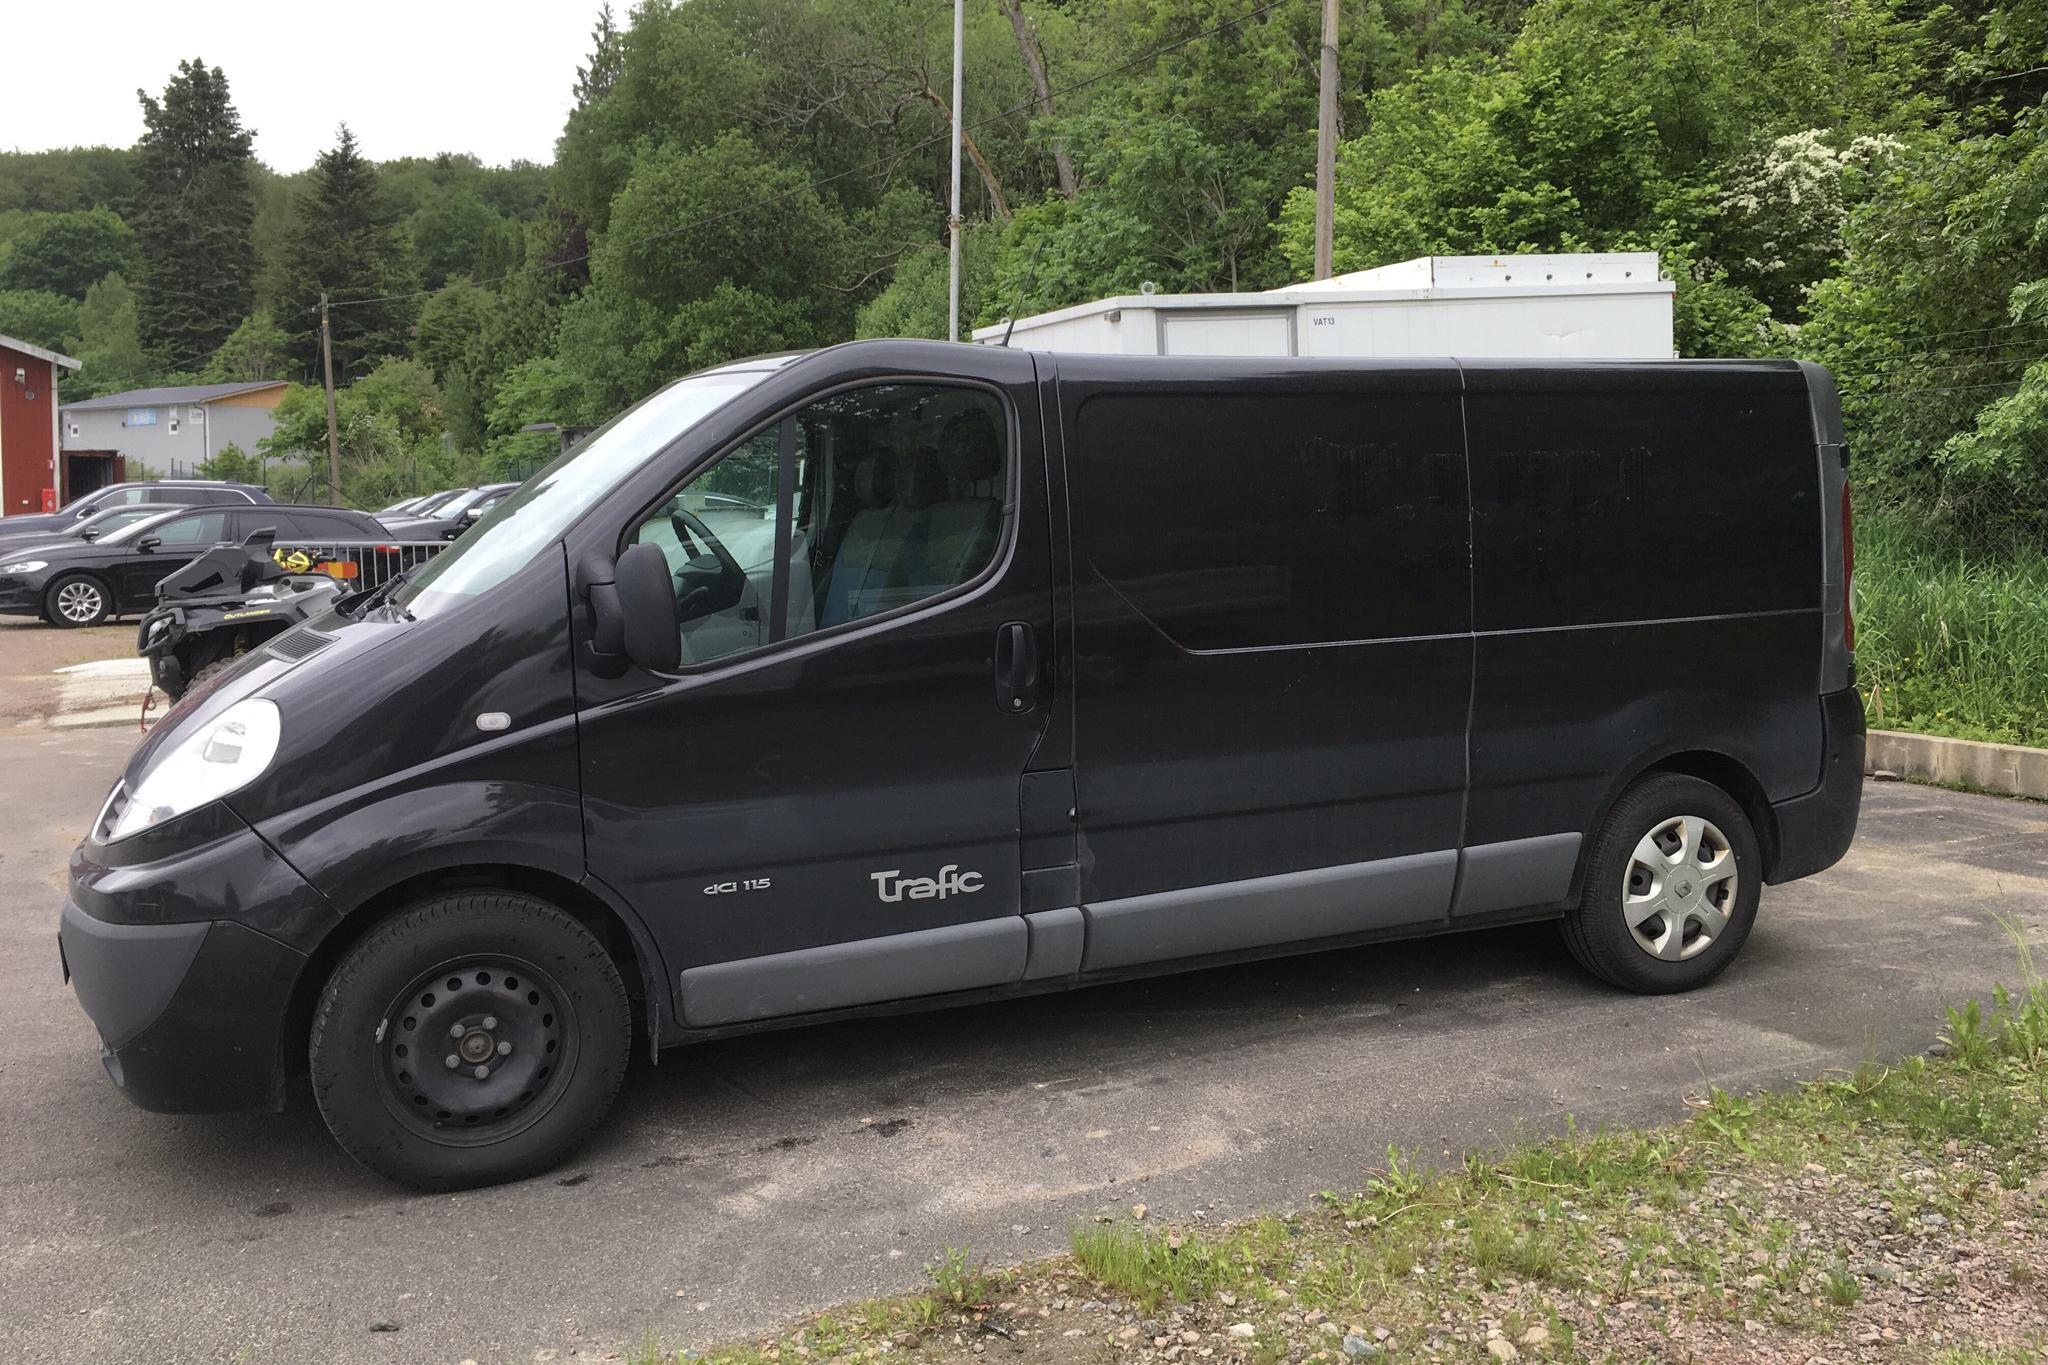 Renault Trafic 2.0 dCi Skåp/Buss (115hk) - 15 230 mil - Manuell - svart - 2014